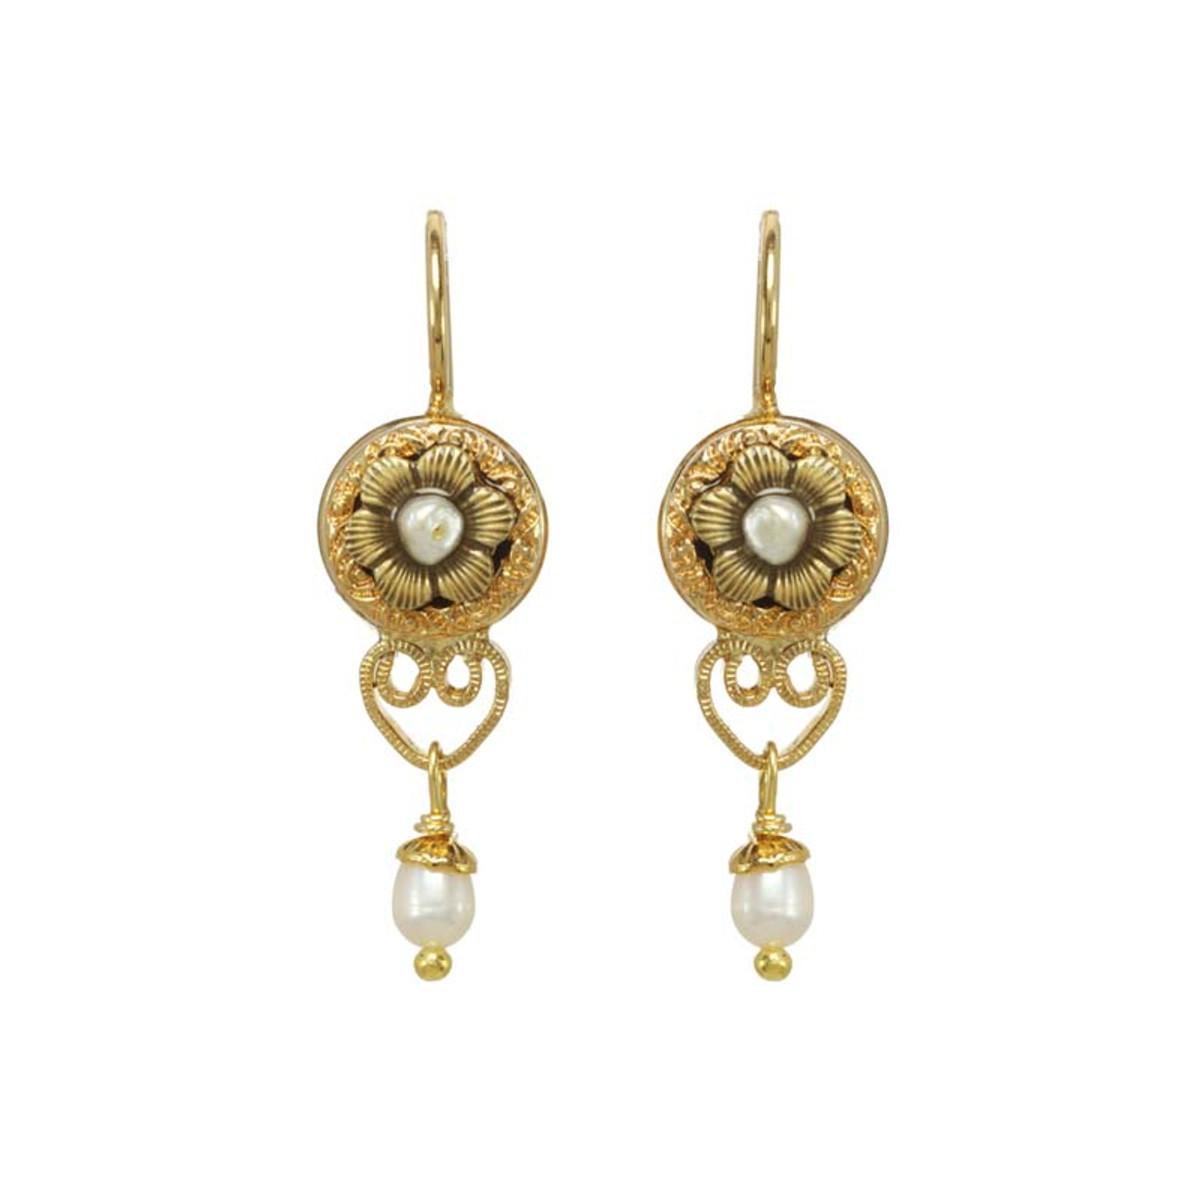 Michal Golan Elegante Earrings